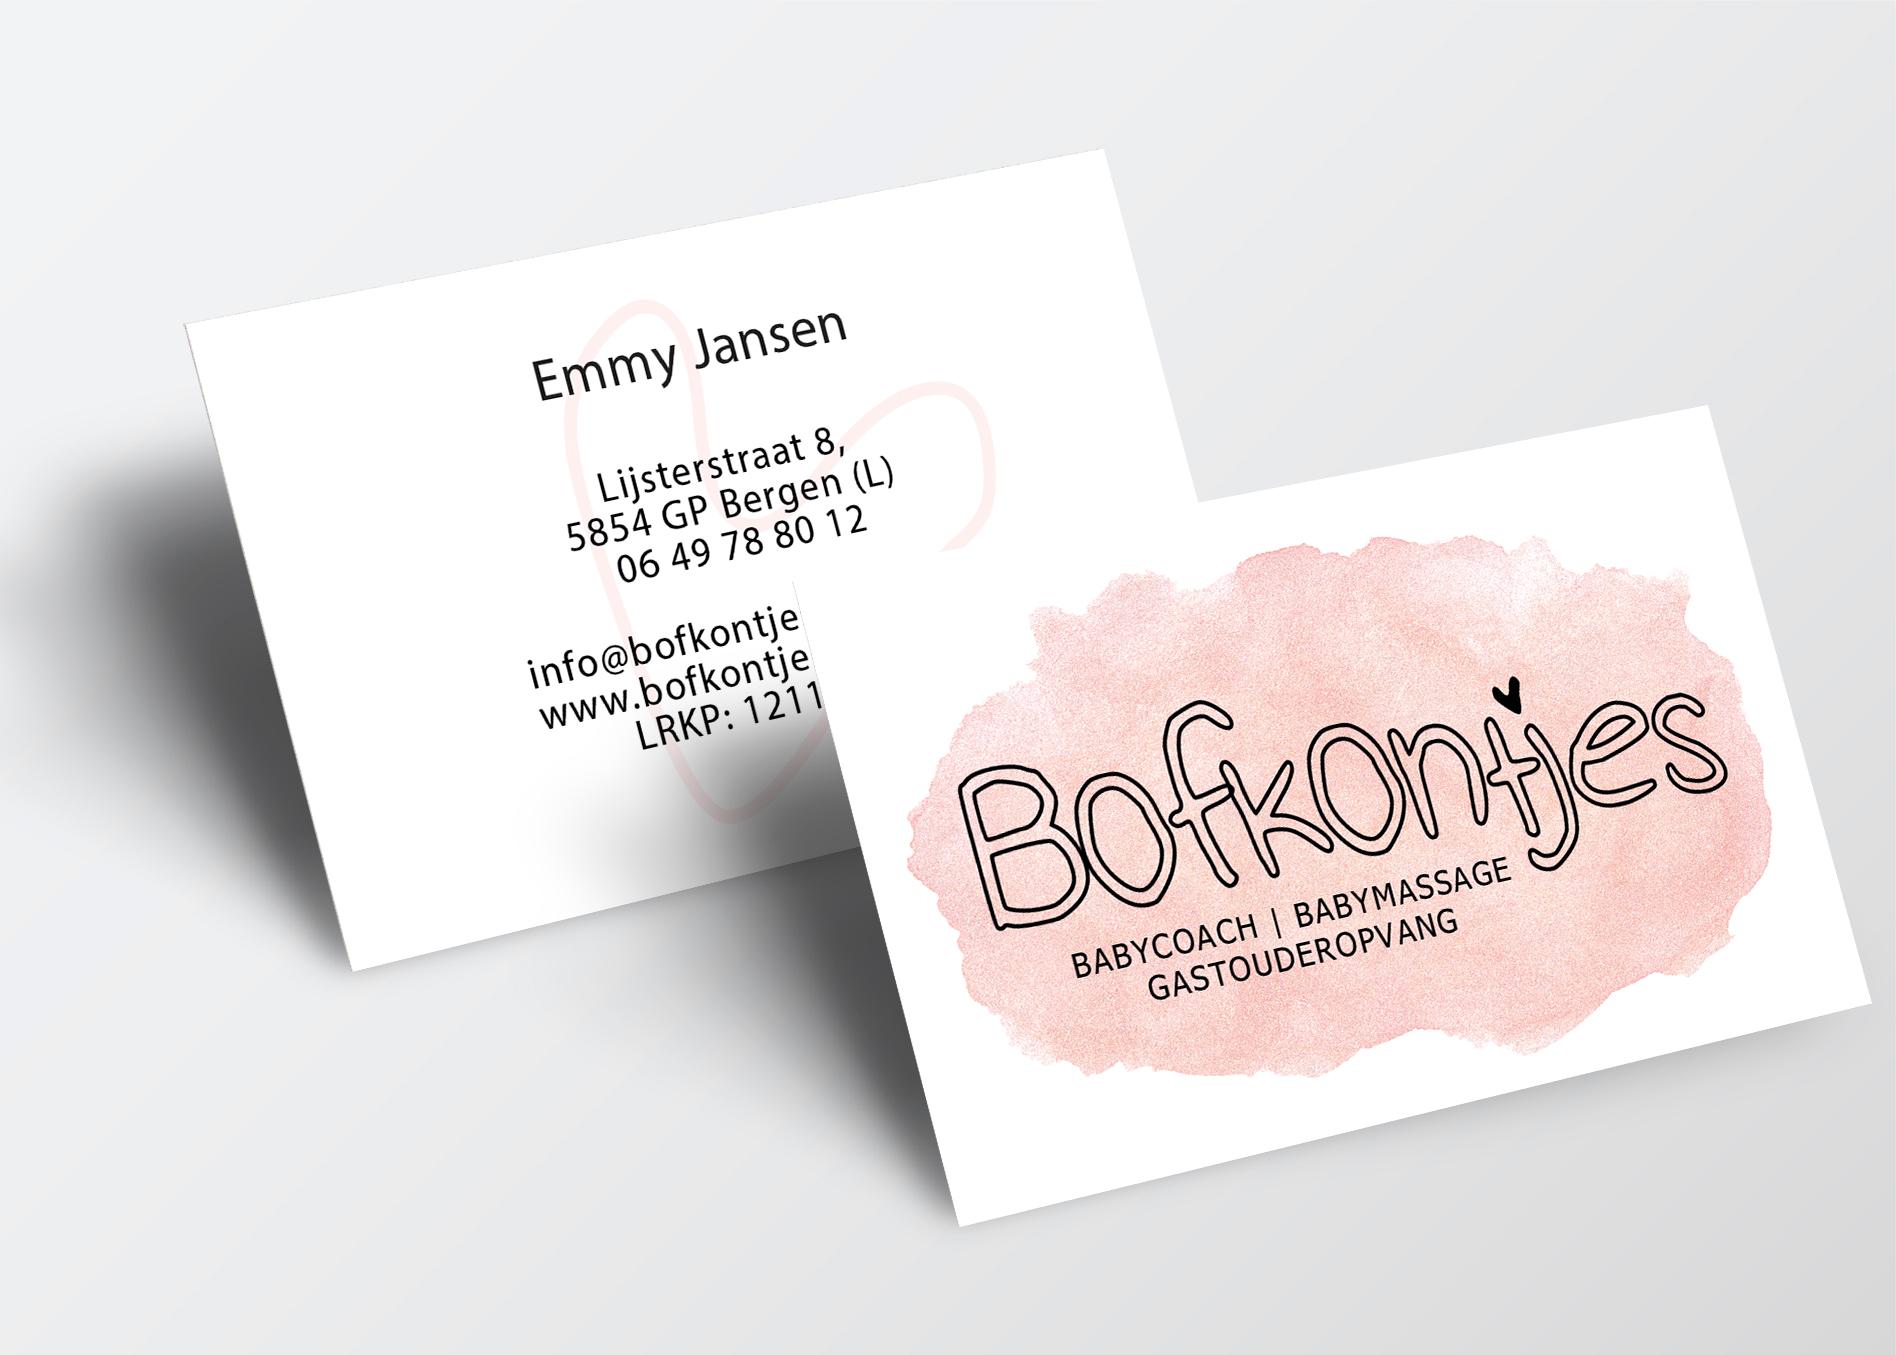 Bofkontjes-babycoach-visitekaartje